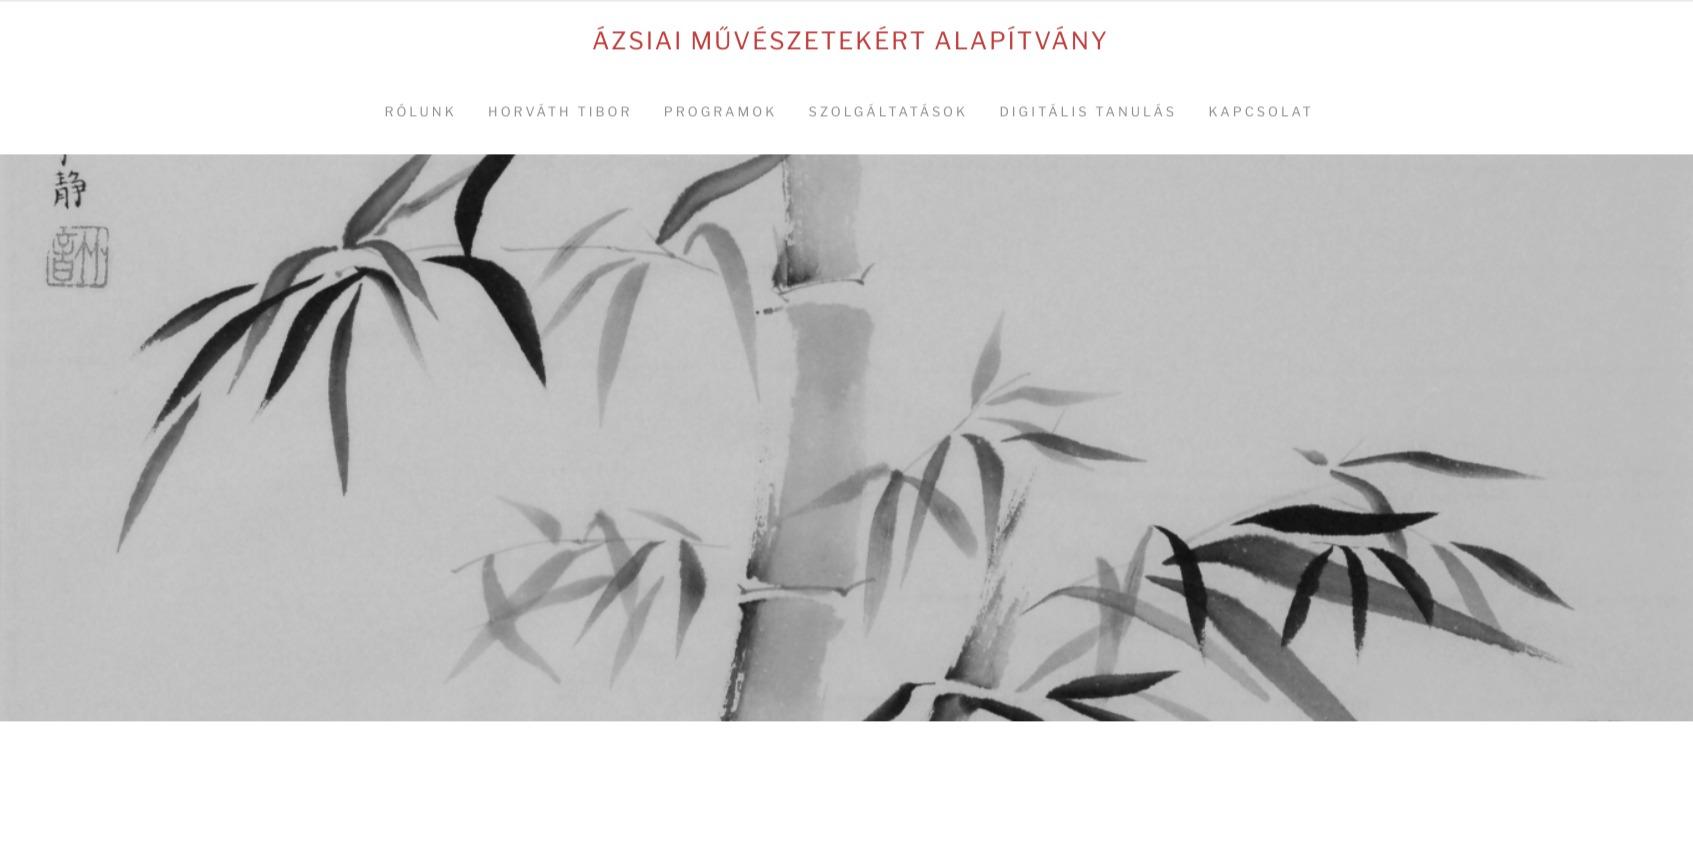 azsiama.hu